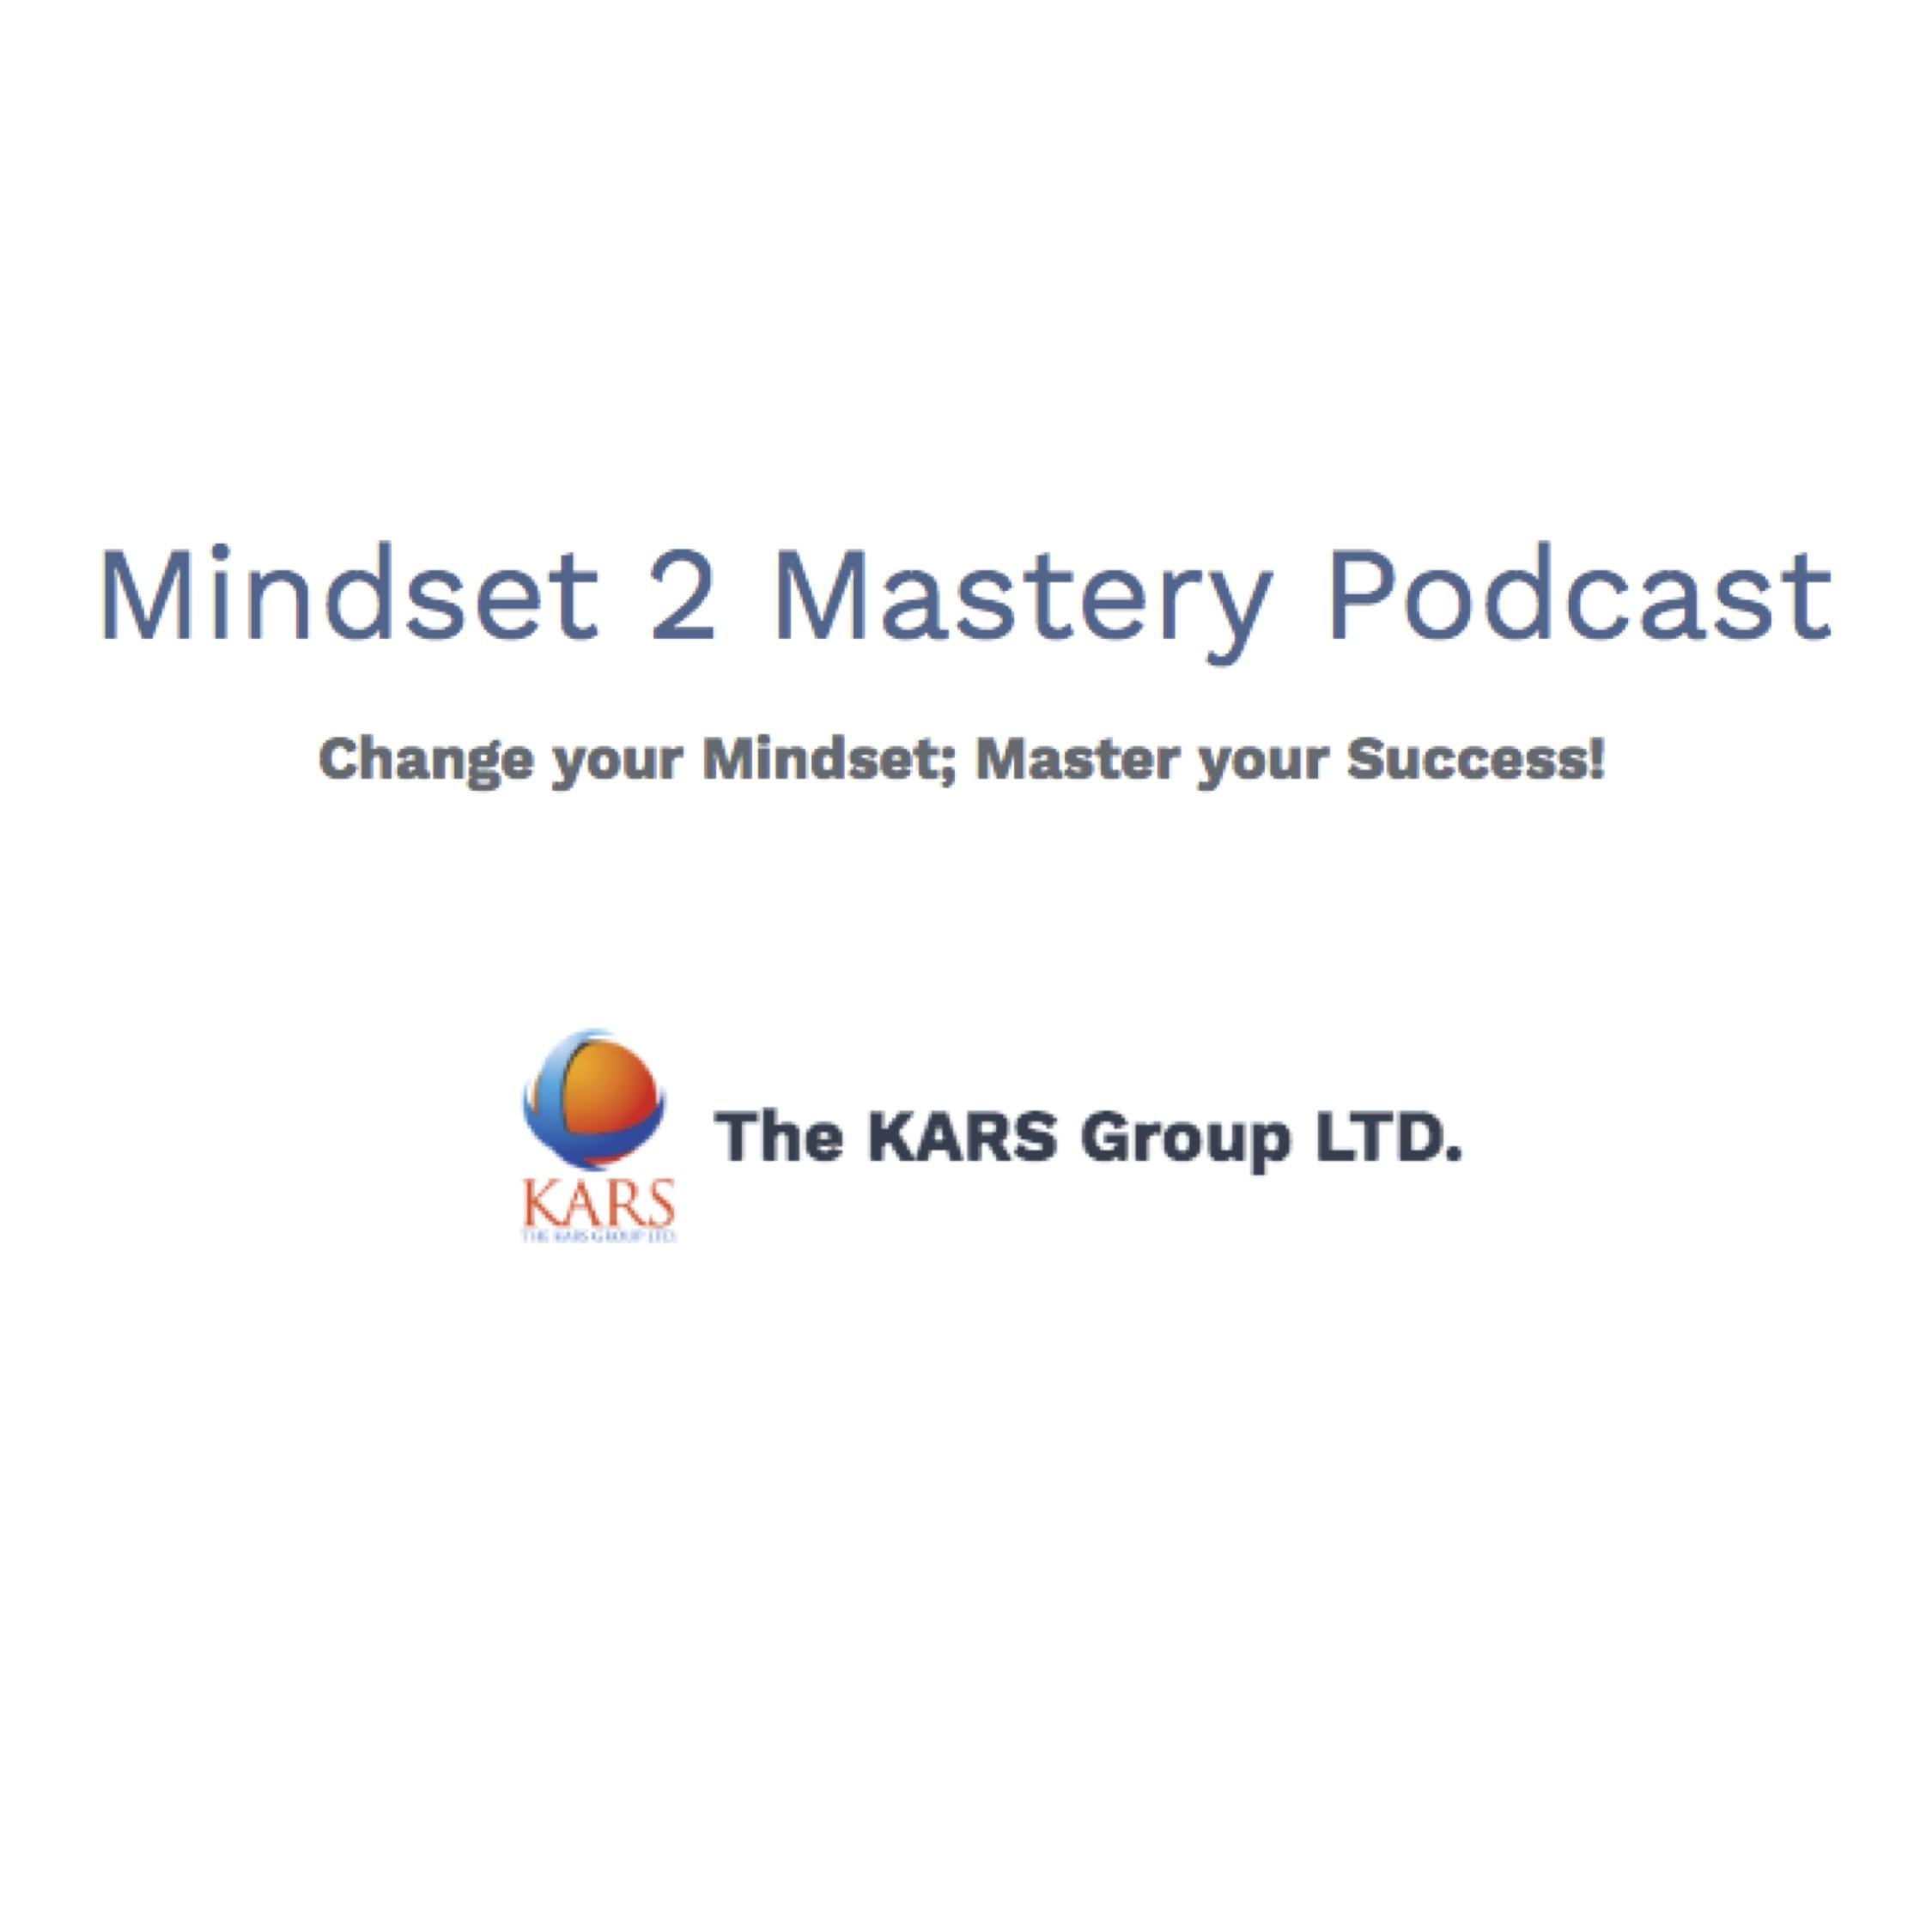 Mindset 2 Mastery copy.jpg